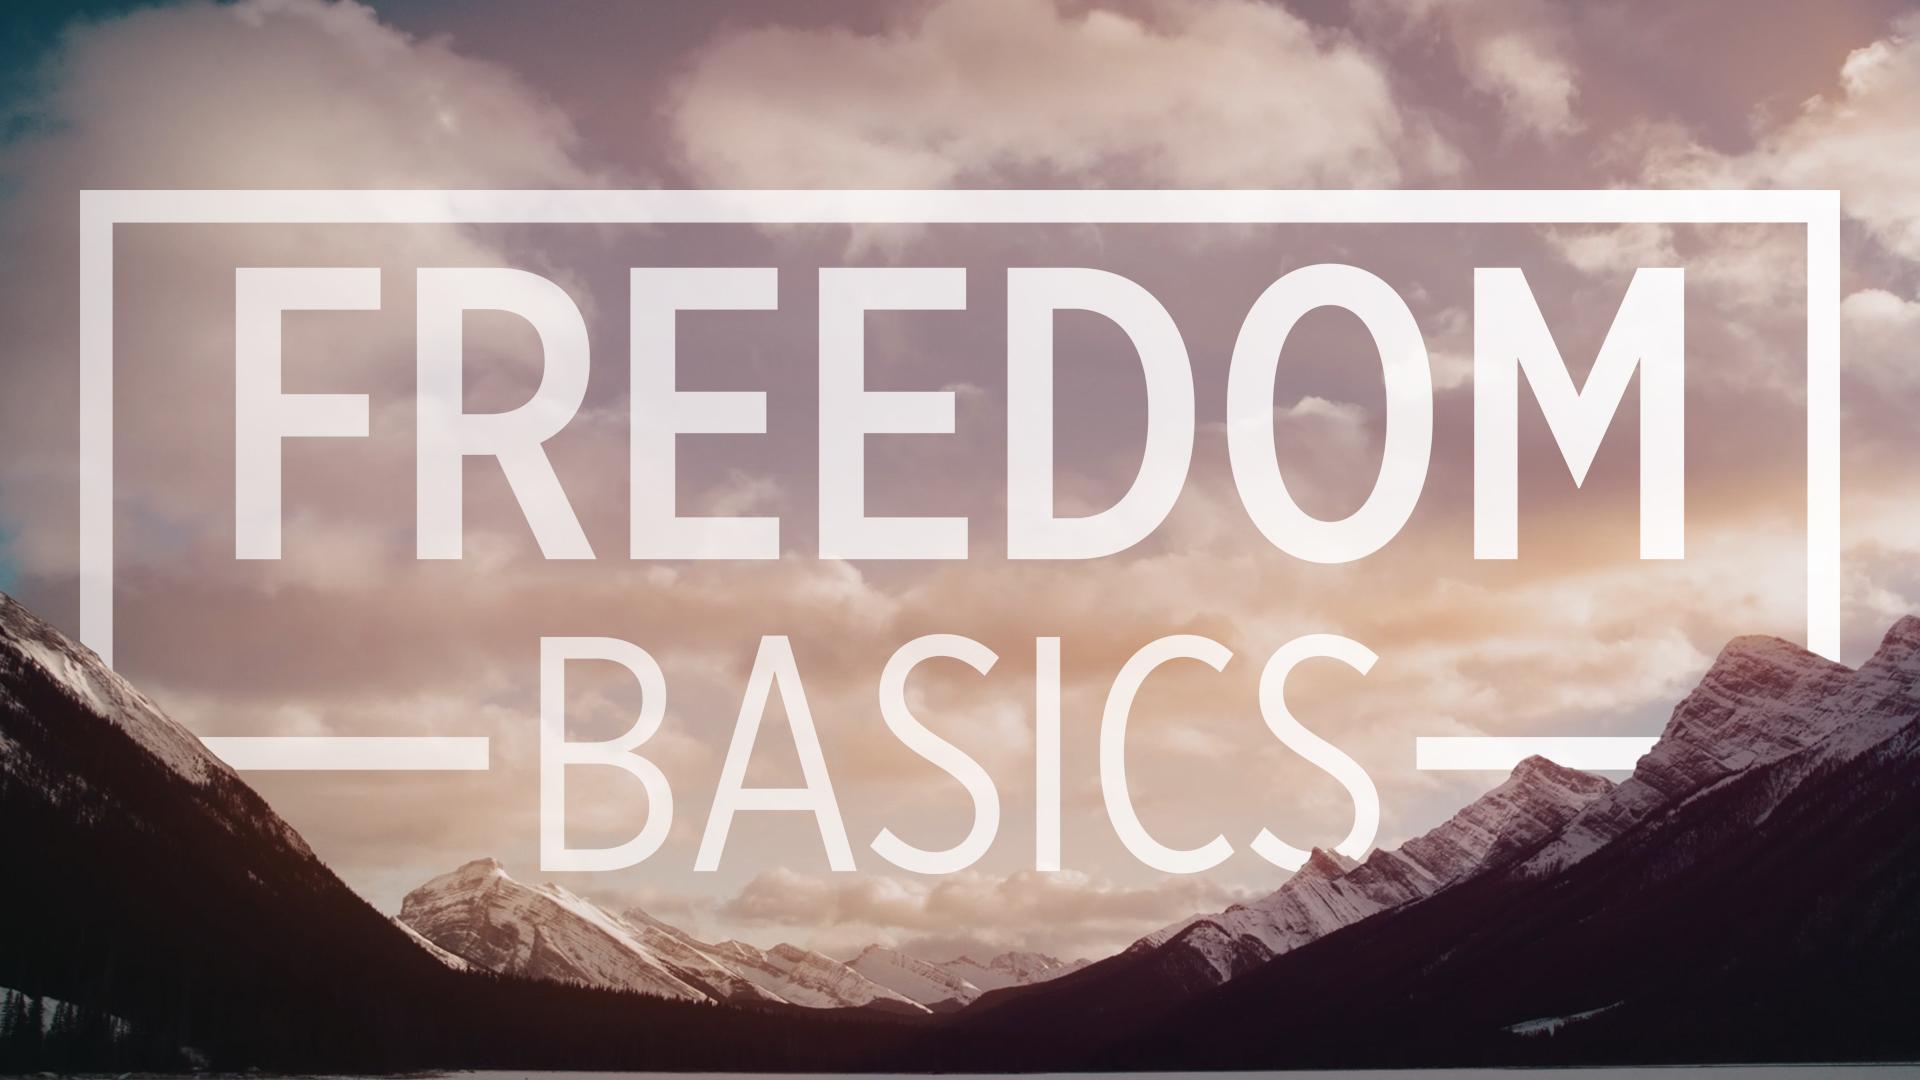 Freedom Basics Series - 4 Classes beginning Sunday Jan 6 at 9:00 am logo